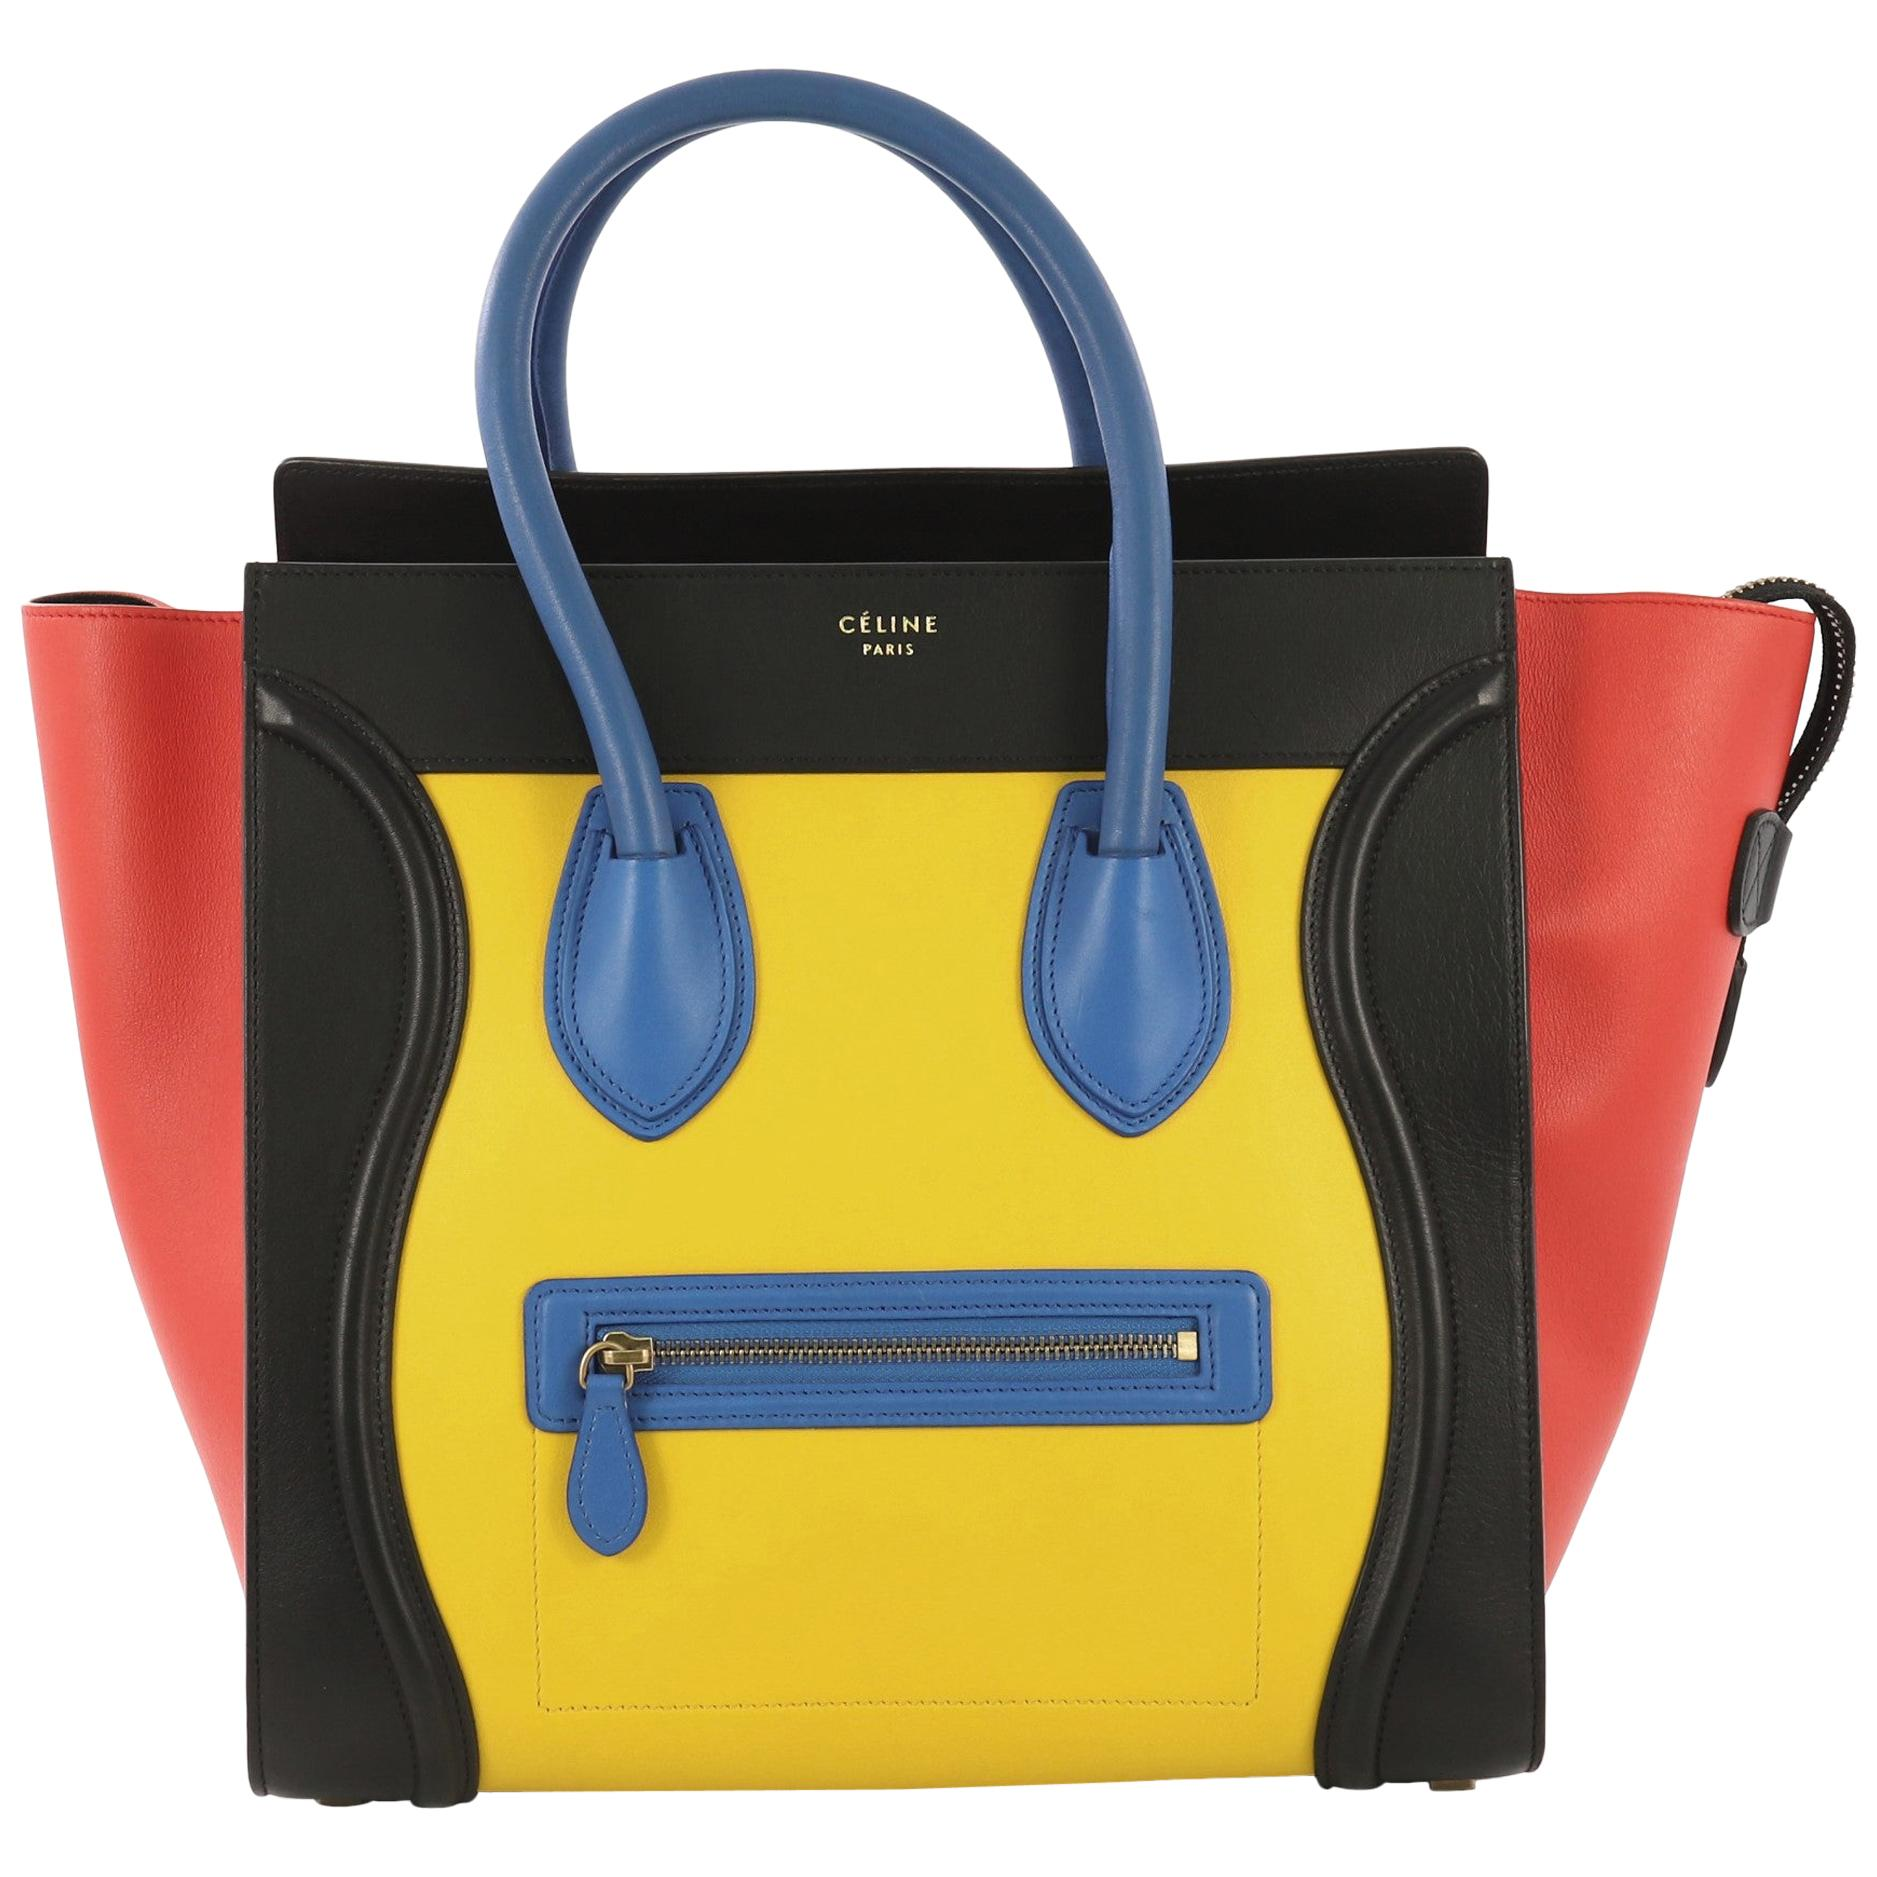 740da64837610 Celine Leather Handbags - 122 For Sale on 1stdibs